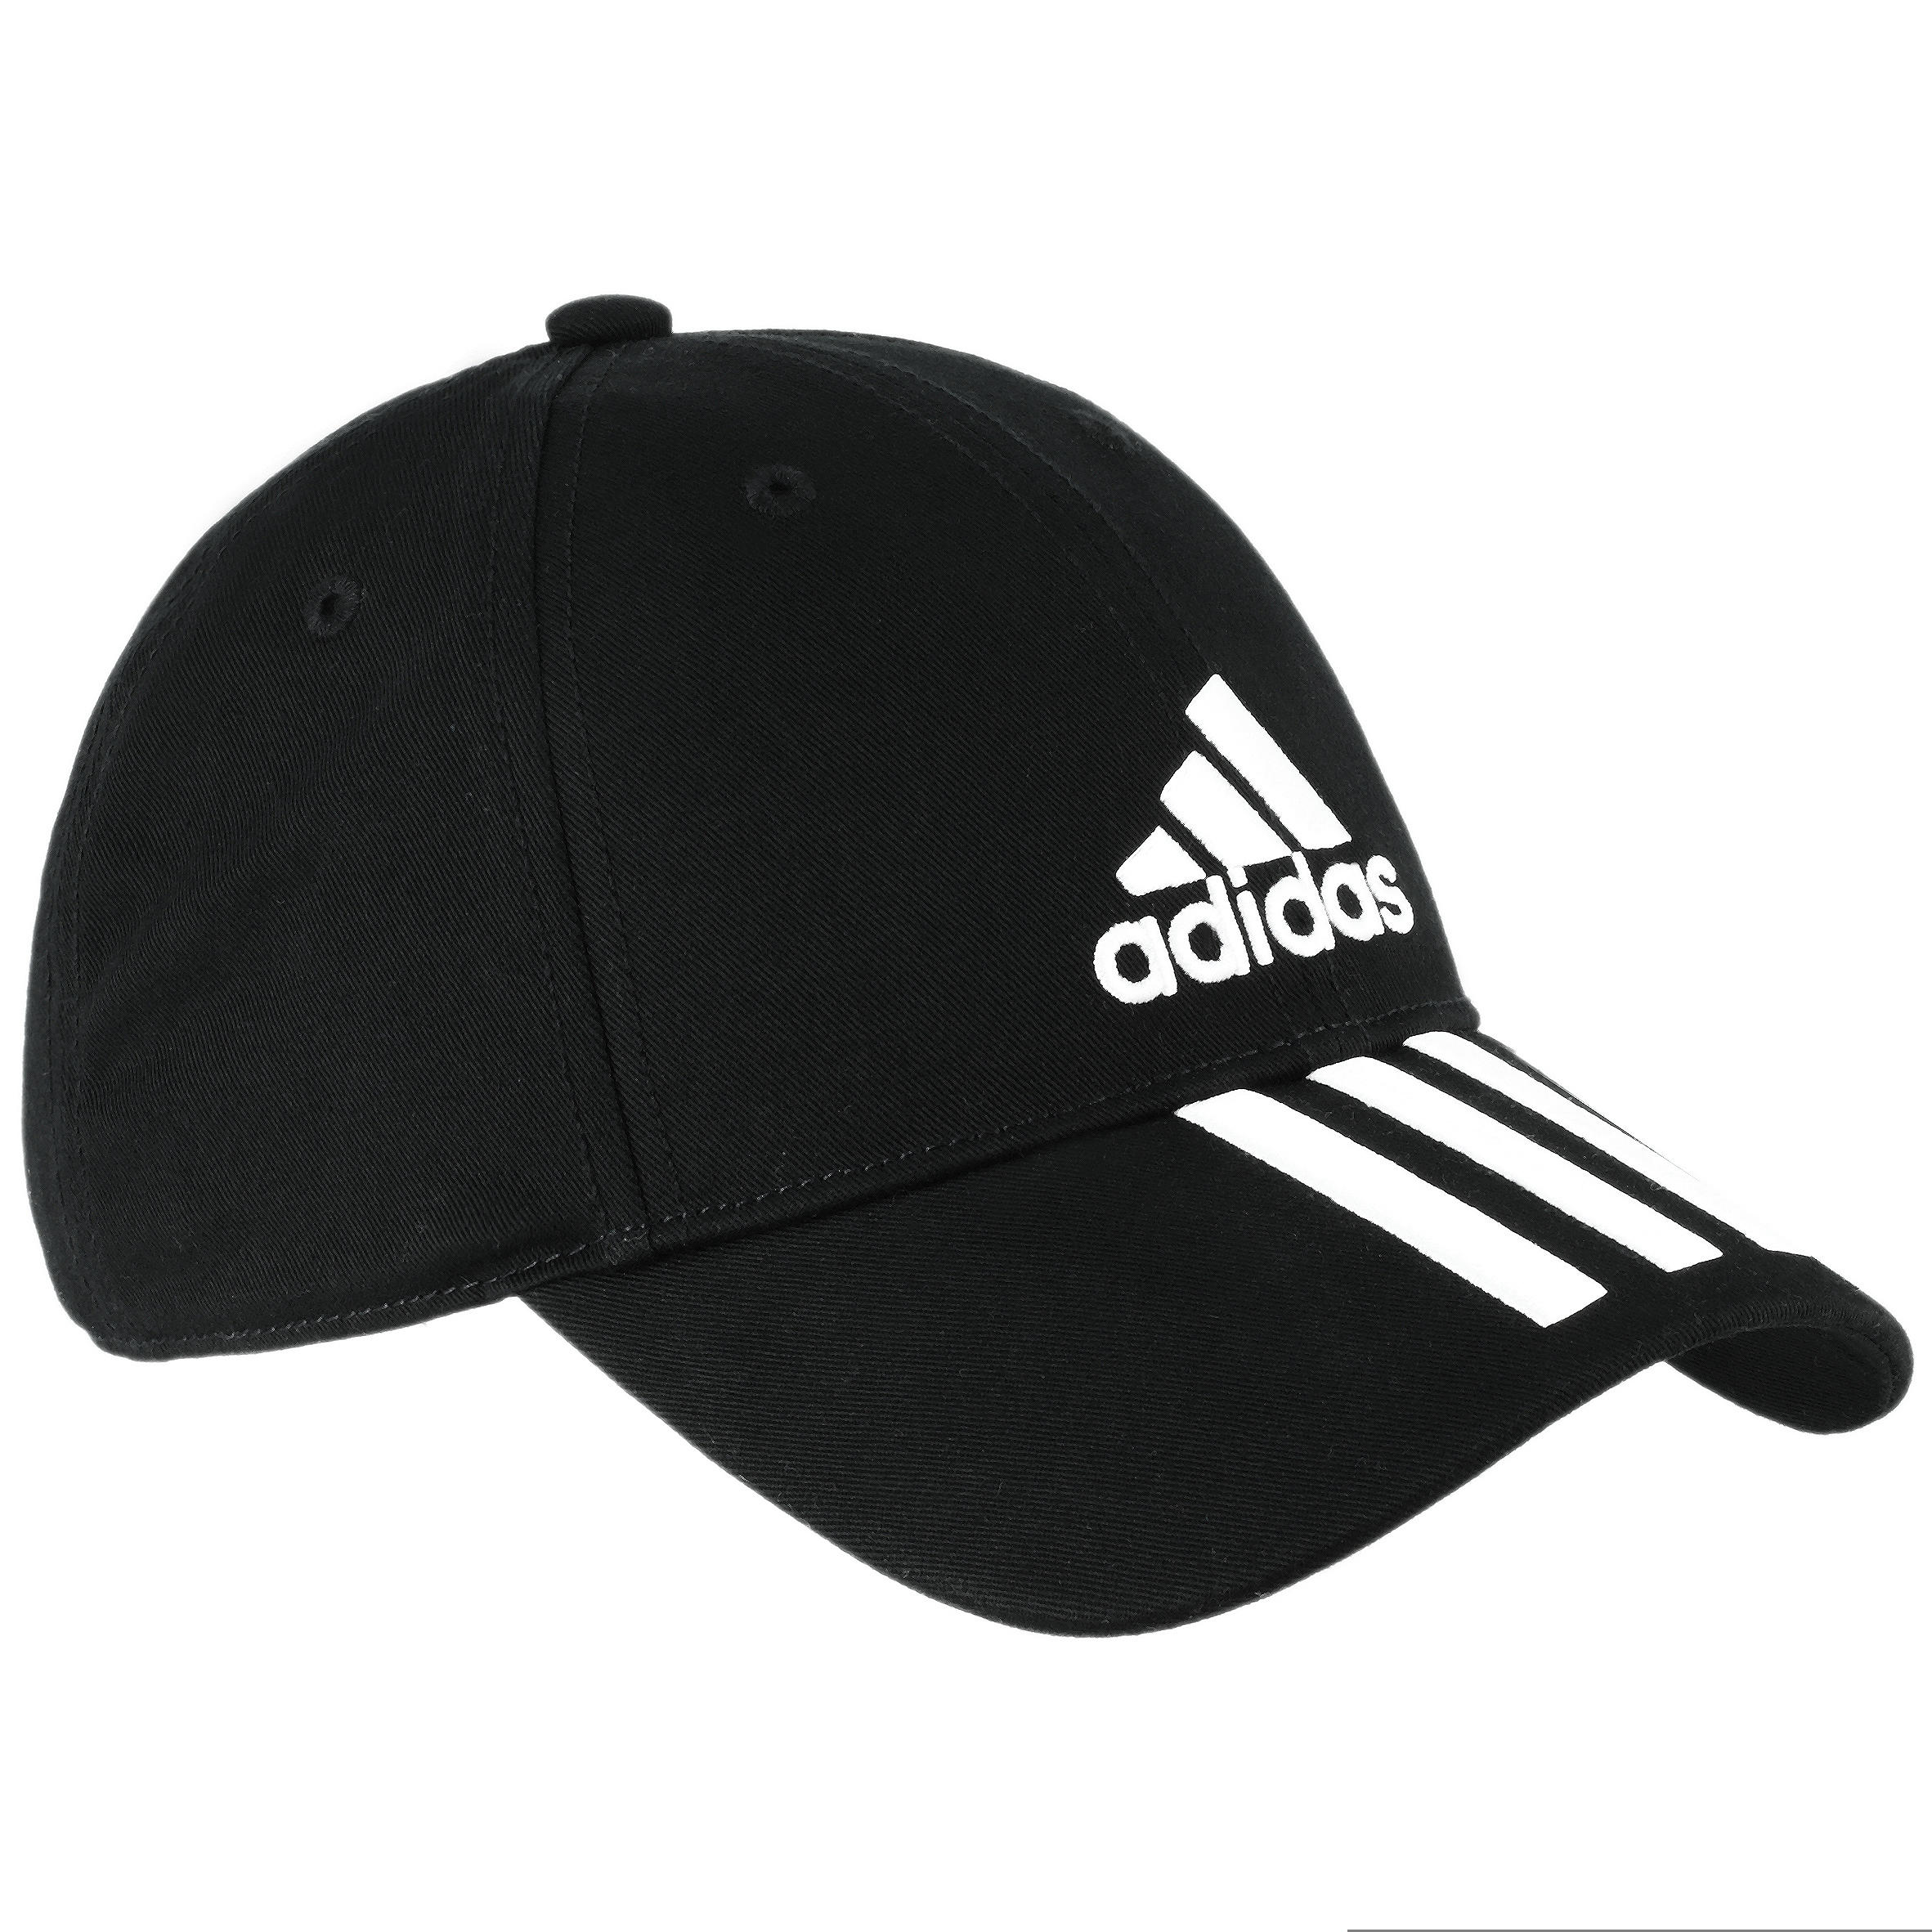 Casquette Adidas fitness noire blanche